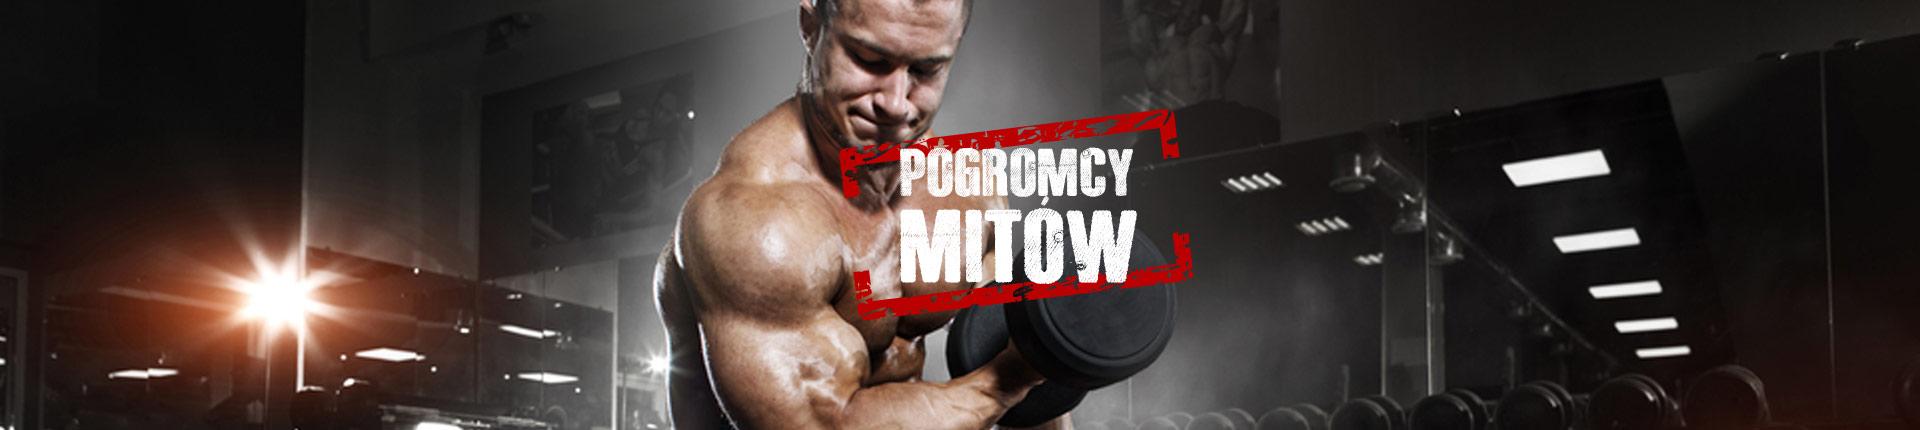 Hormony, katabolizm, aeroby i trening na czczo